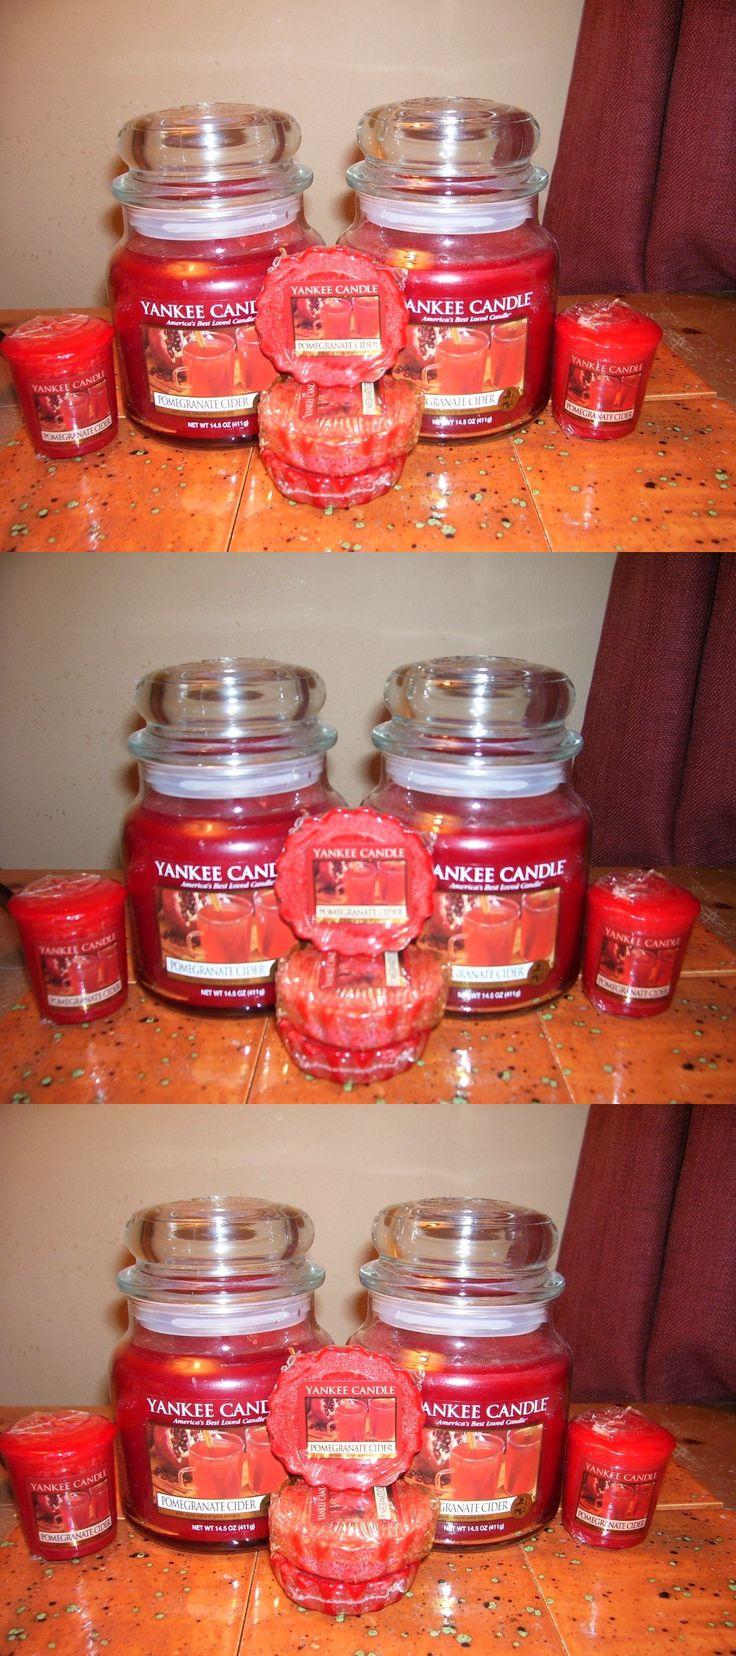 Candles 46782: Yankee Candle 2-14.5Oz Jars Pomegranate Cider+ 3 Tarts+2 Votives -> BUY IT NOW ONLY: $36 on eBay!